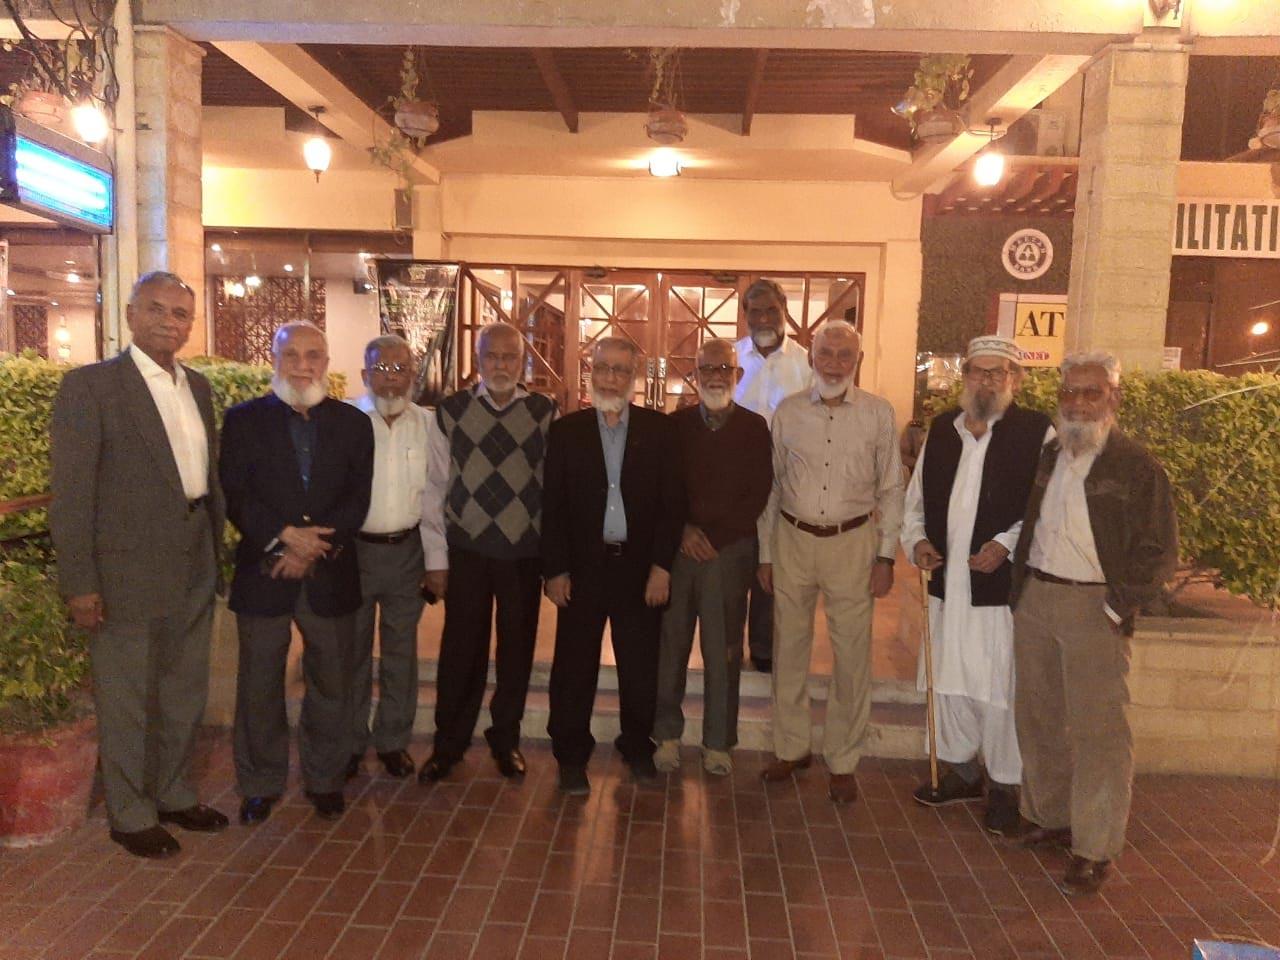 Mohammad Afzal, Syed Zafar Ahmad, Iqbal Ahmed Khan, Rahmatullah Ganaai, Khalid Iqbal, Sharif Ur Rehman Malik, Aqleem Aleem, Babar Ghaznavi, Hasan Habib Imdadi on the back M. Mahtab Alam Khan